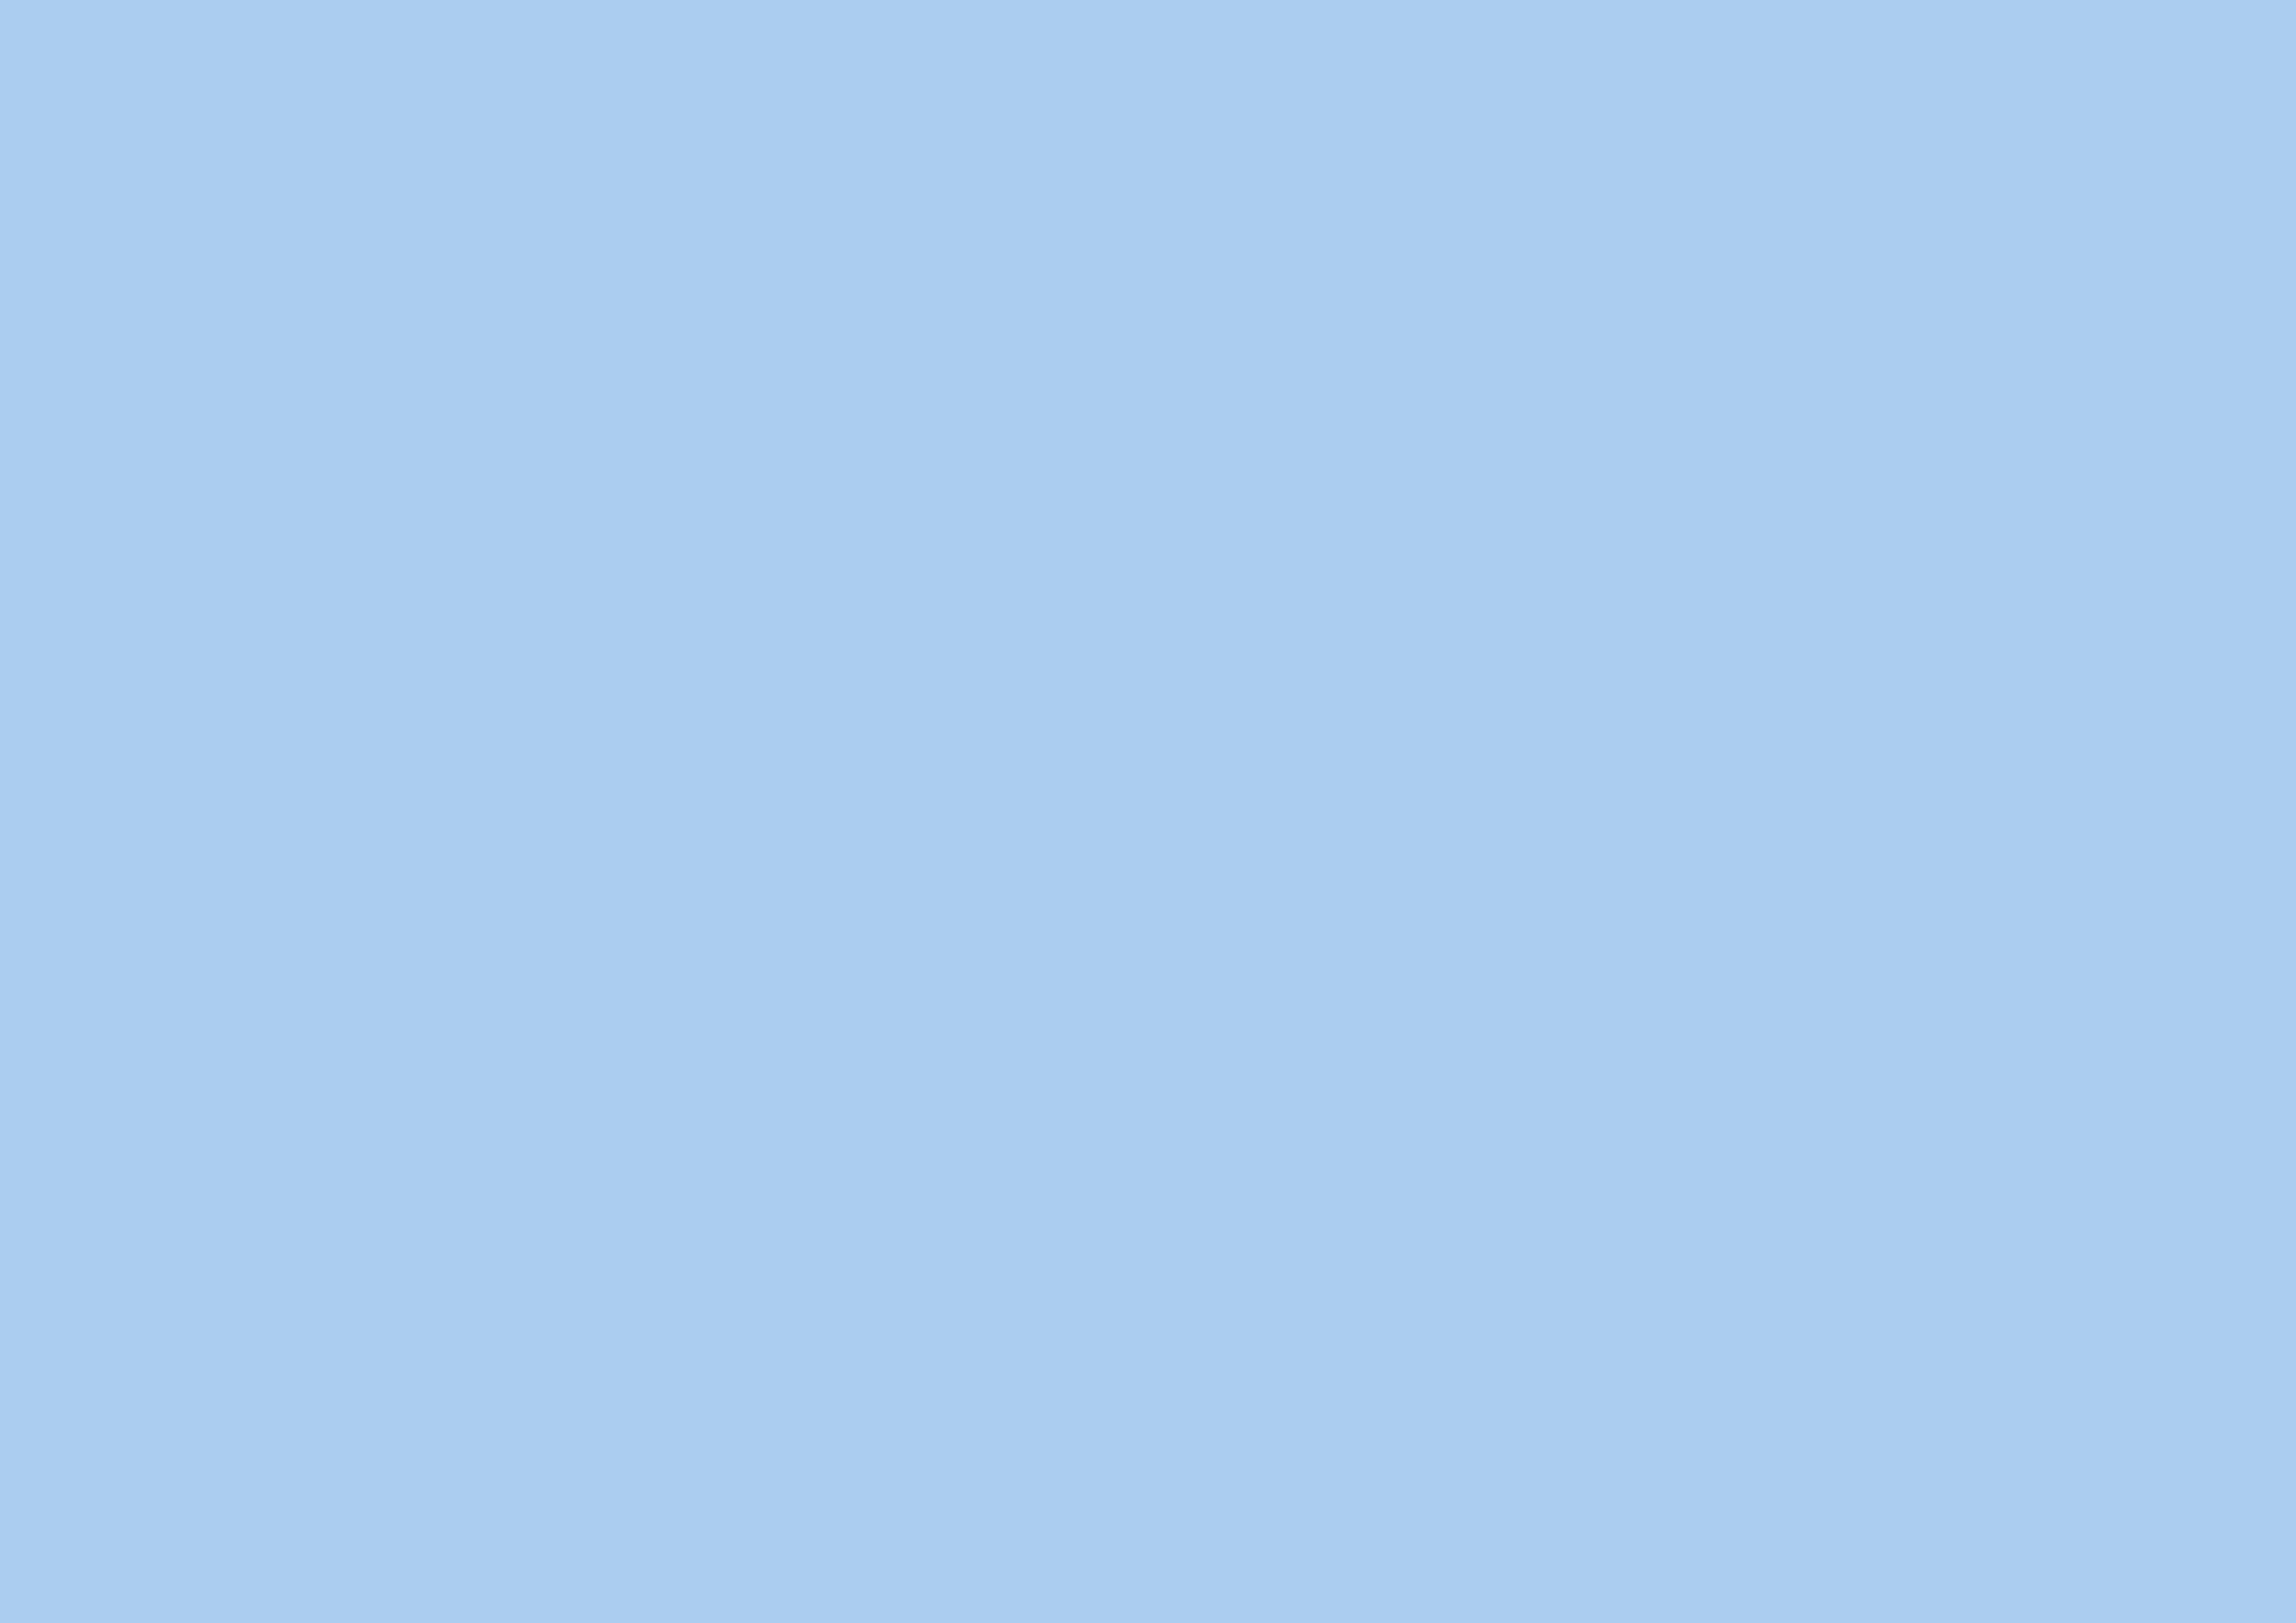 3508x2480 Pale Cornflower Blue Solid Color Background